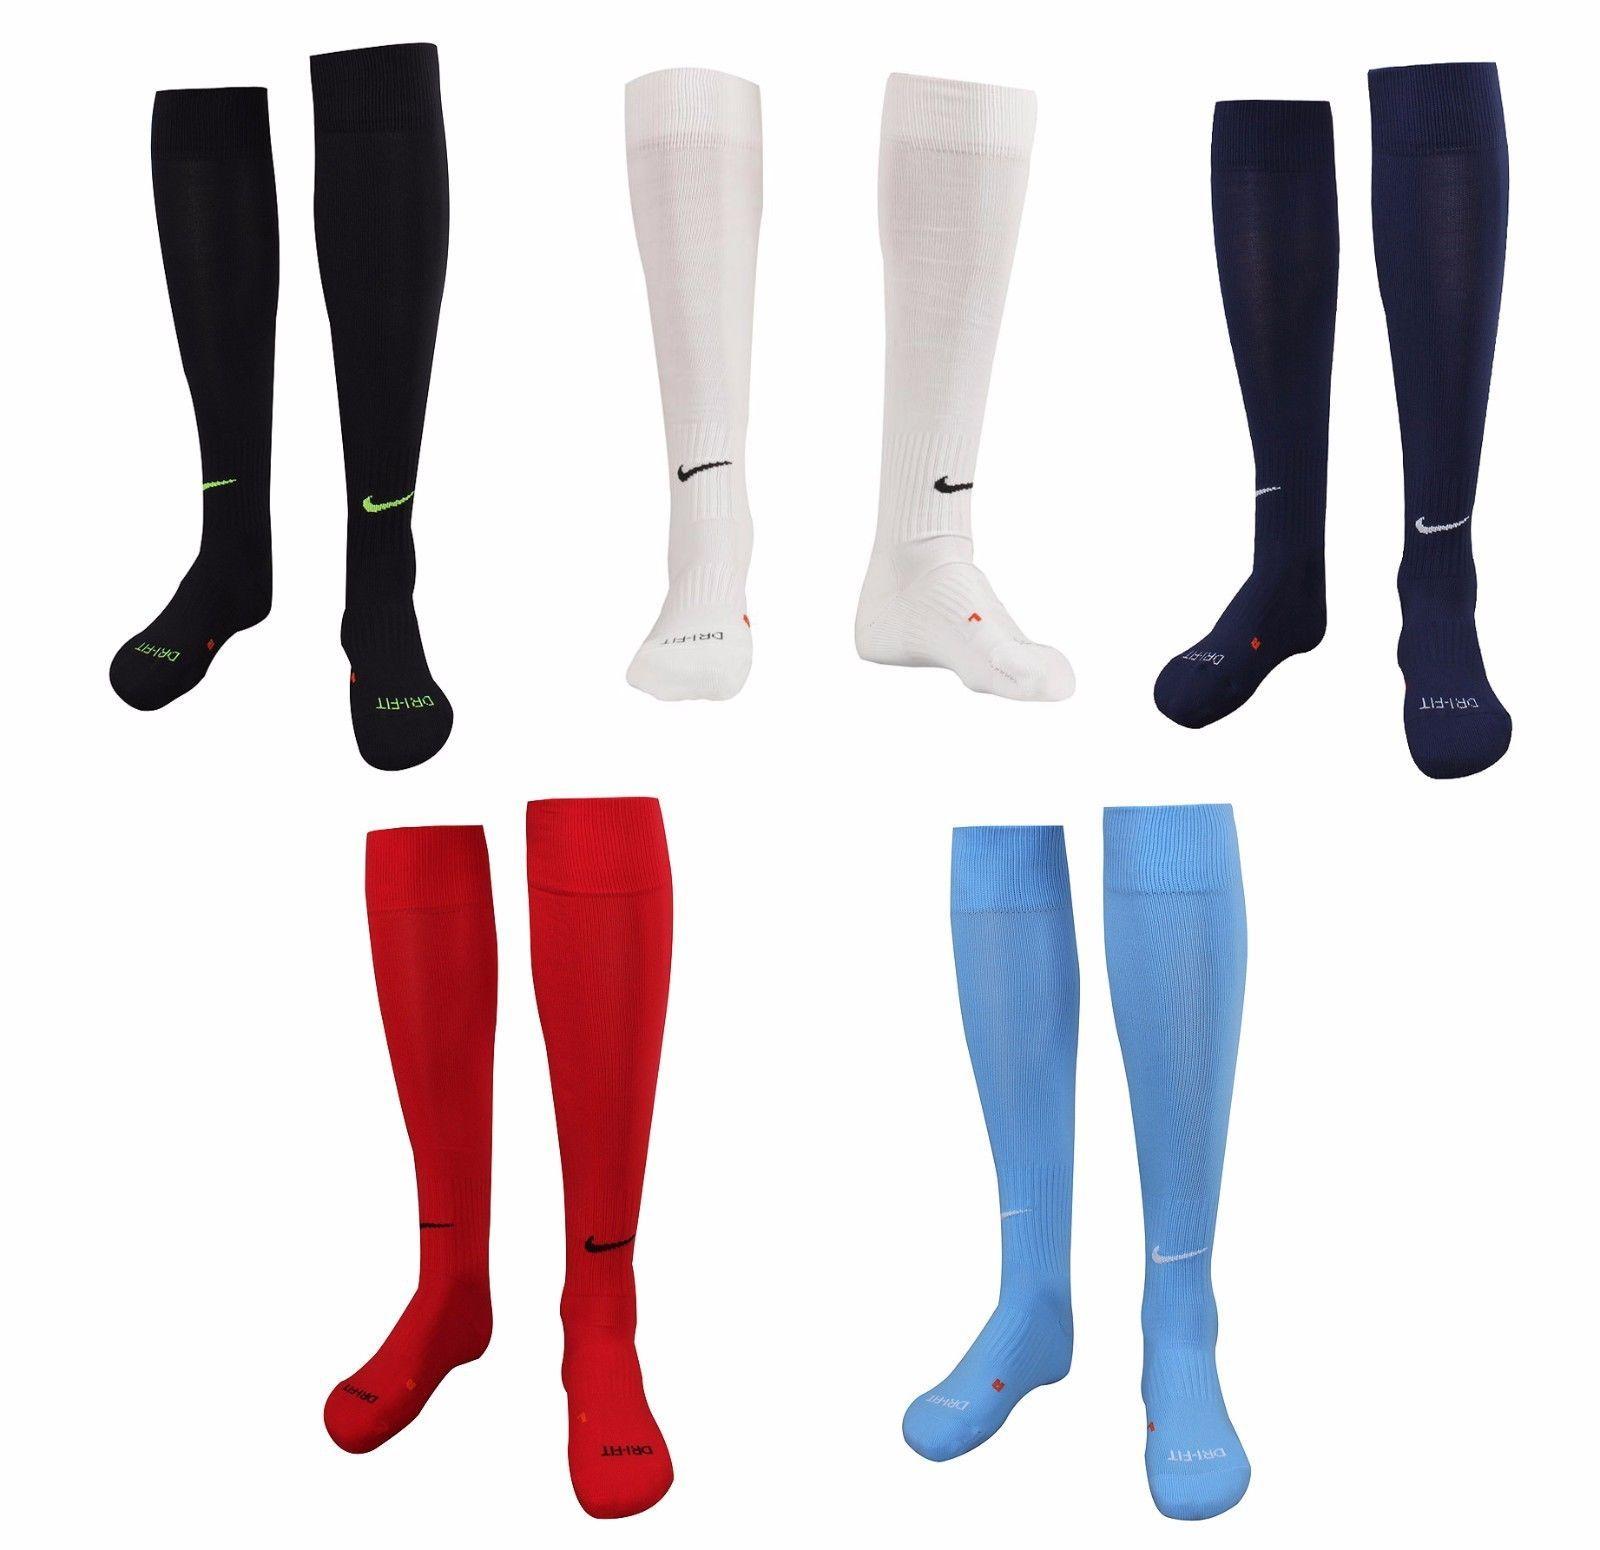 Nike Classic 2 Soccer Socks Football Sock Dri Fit 394386 5 Colors Soccer Socks Football Socks Nike Classic